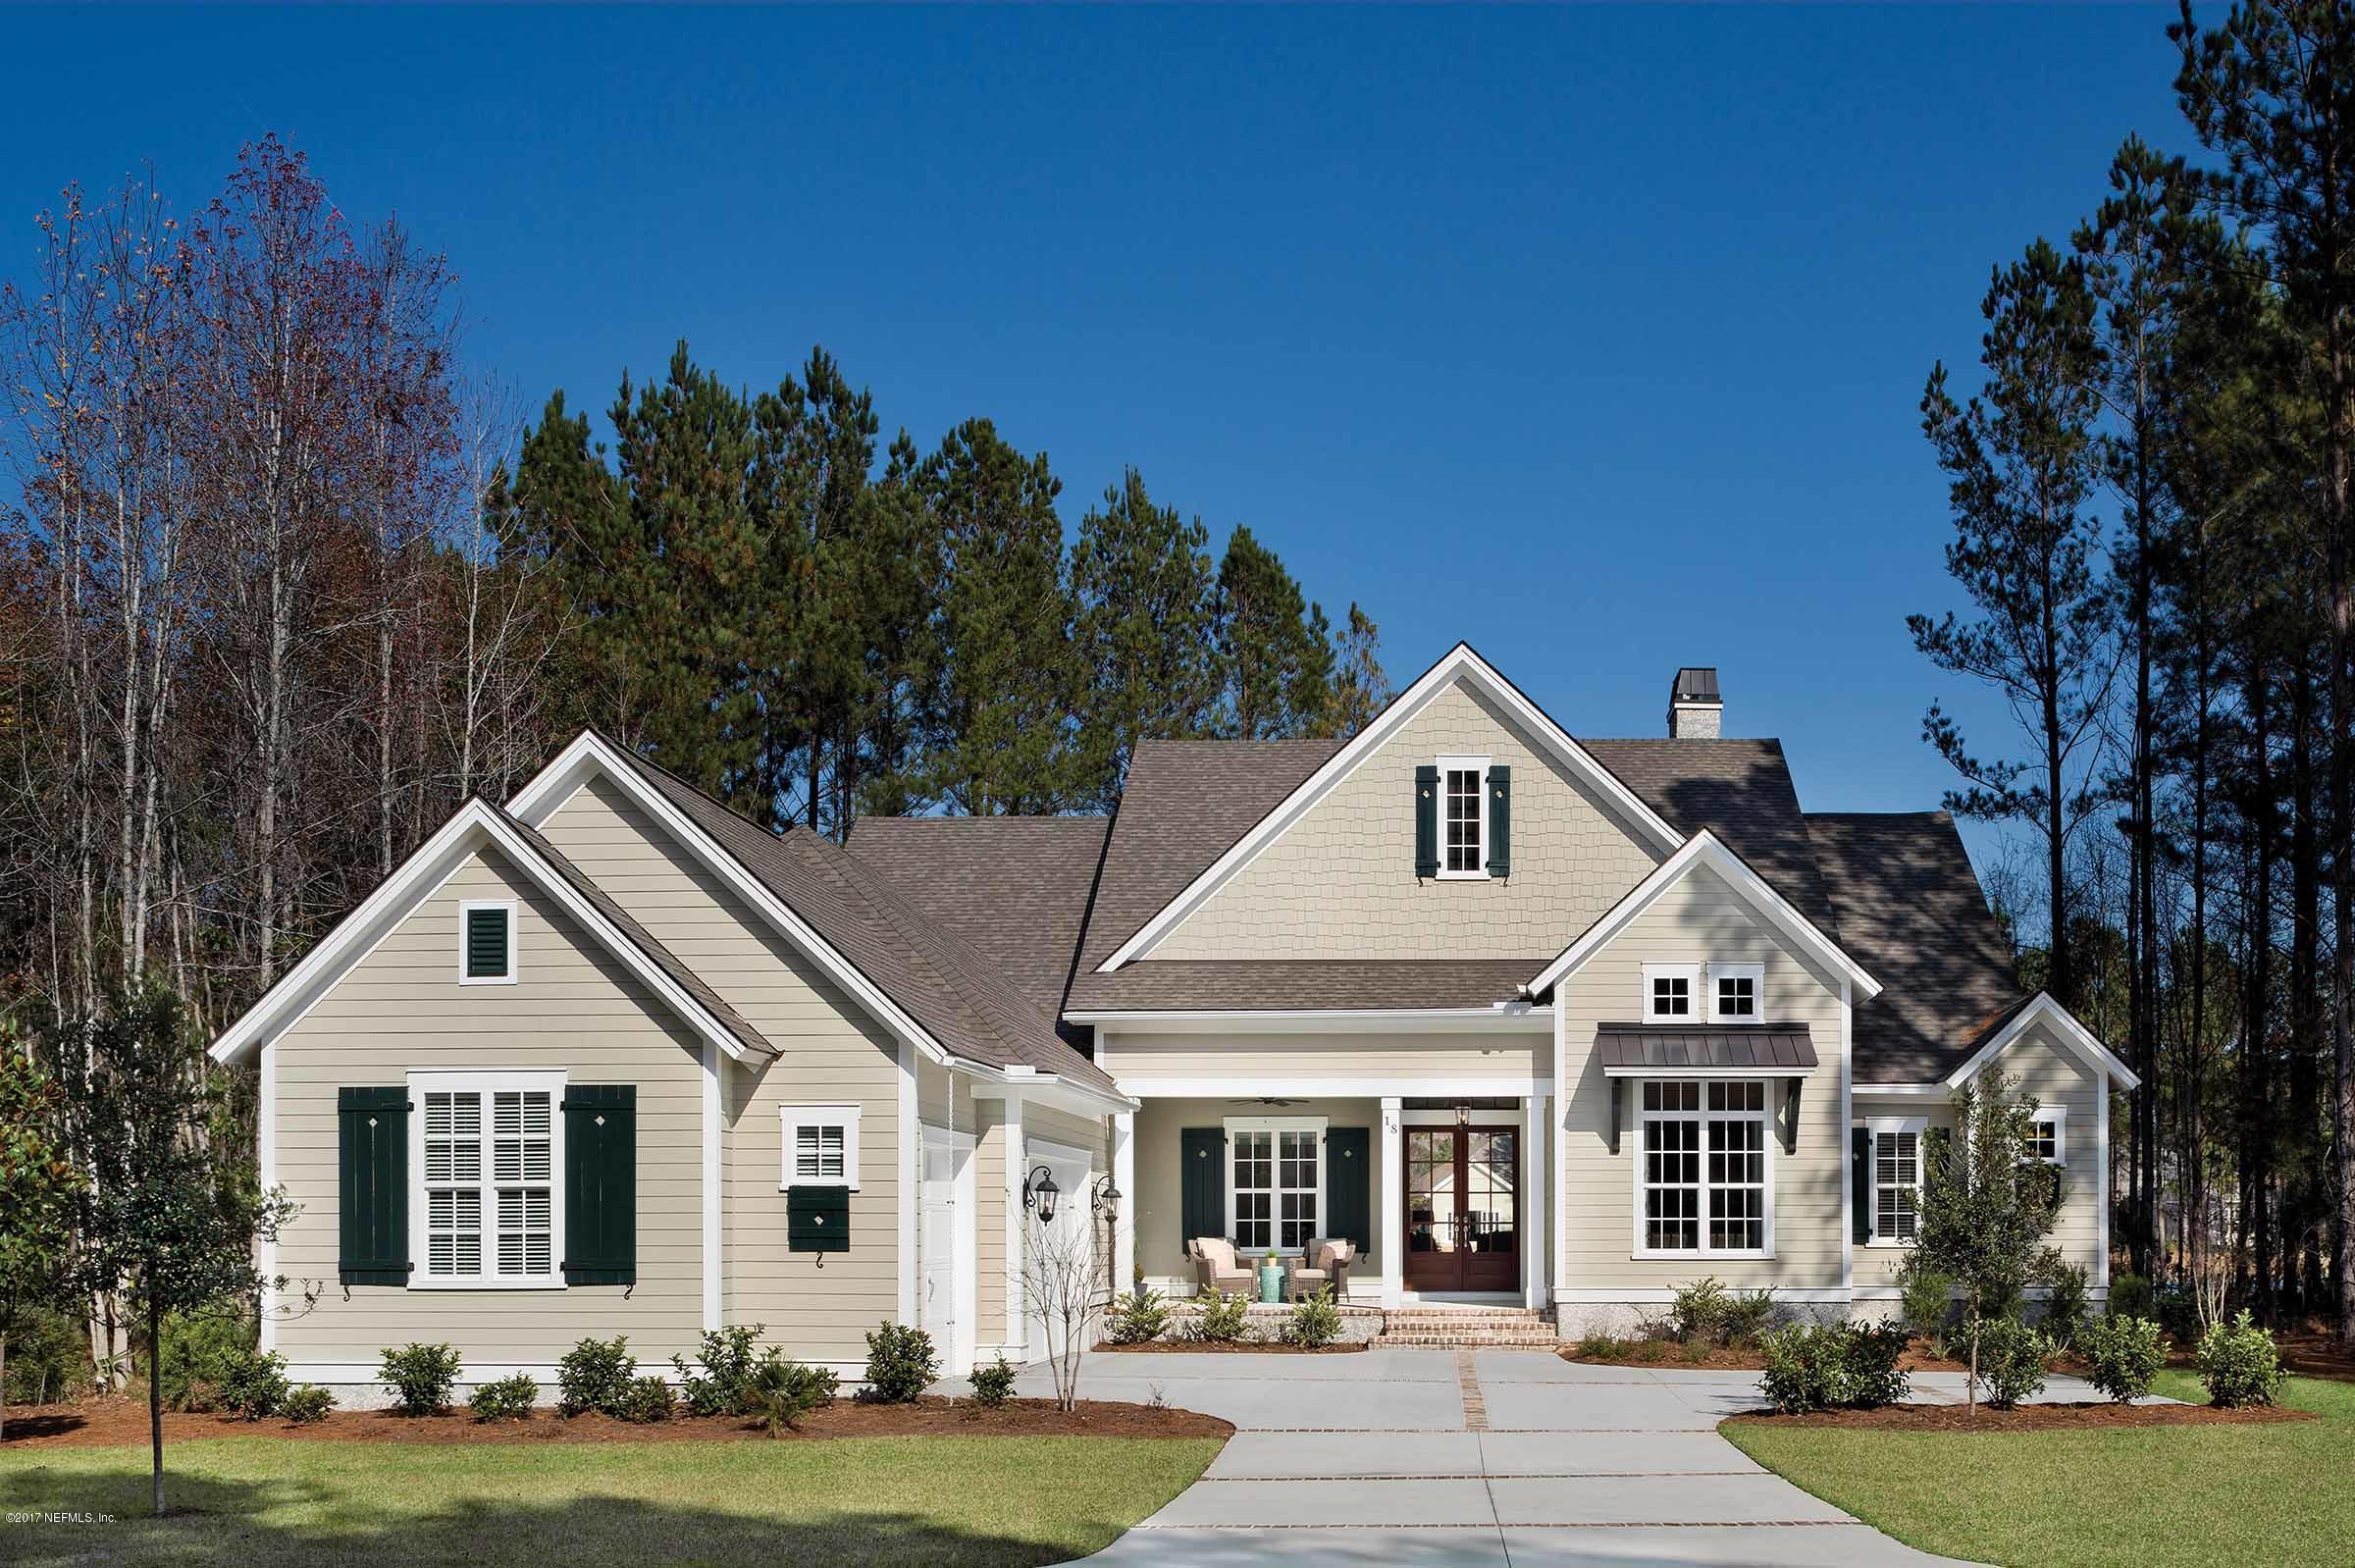 97A SAN CRISTOBAL, ST AUGUSTINE, FLORIDA 32095, 3 Bedrooms Bedrooms, ,3 BathroomsBathrooms,Residential - single family,For sale,SAN CRISTOBAL,894753